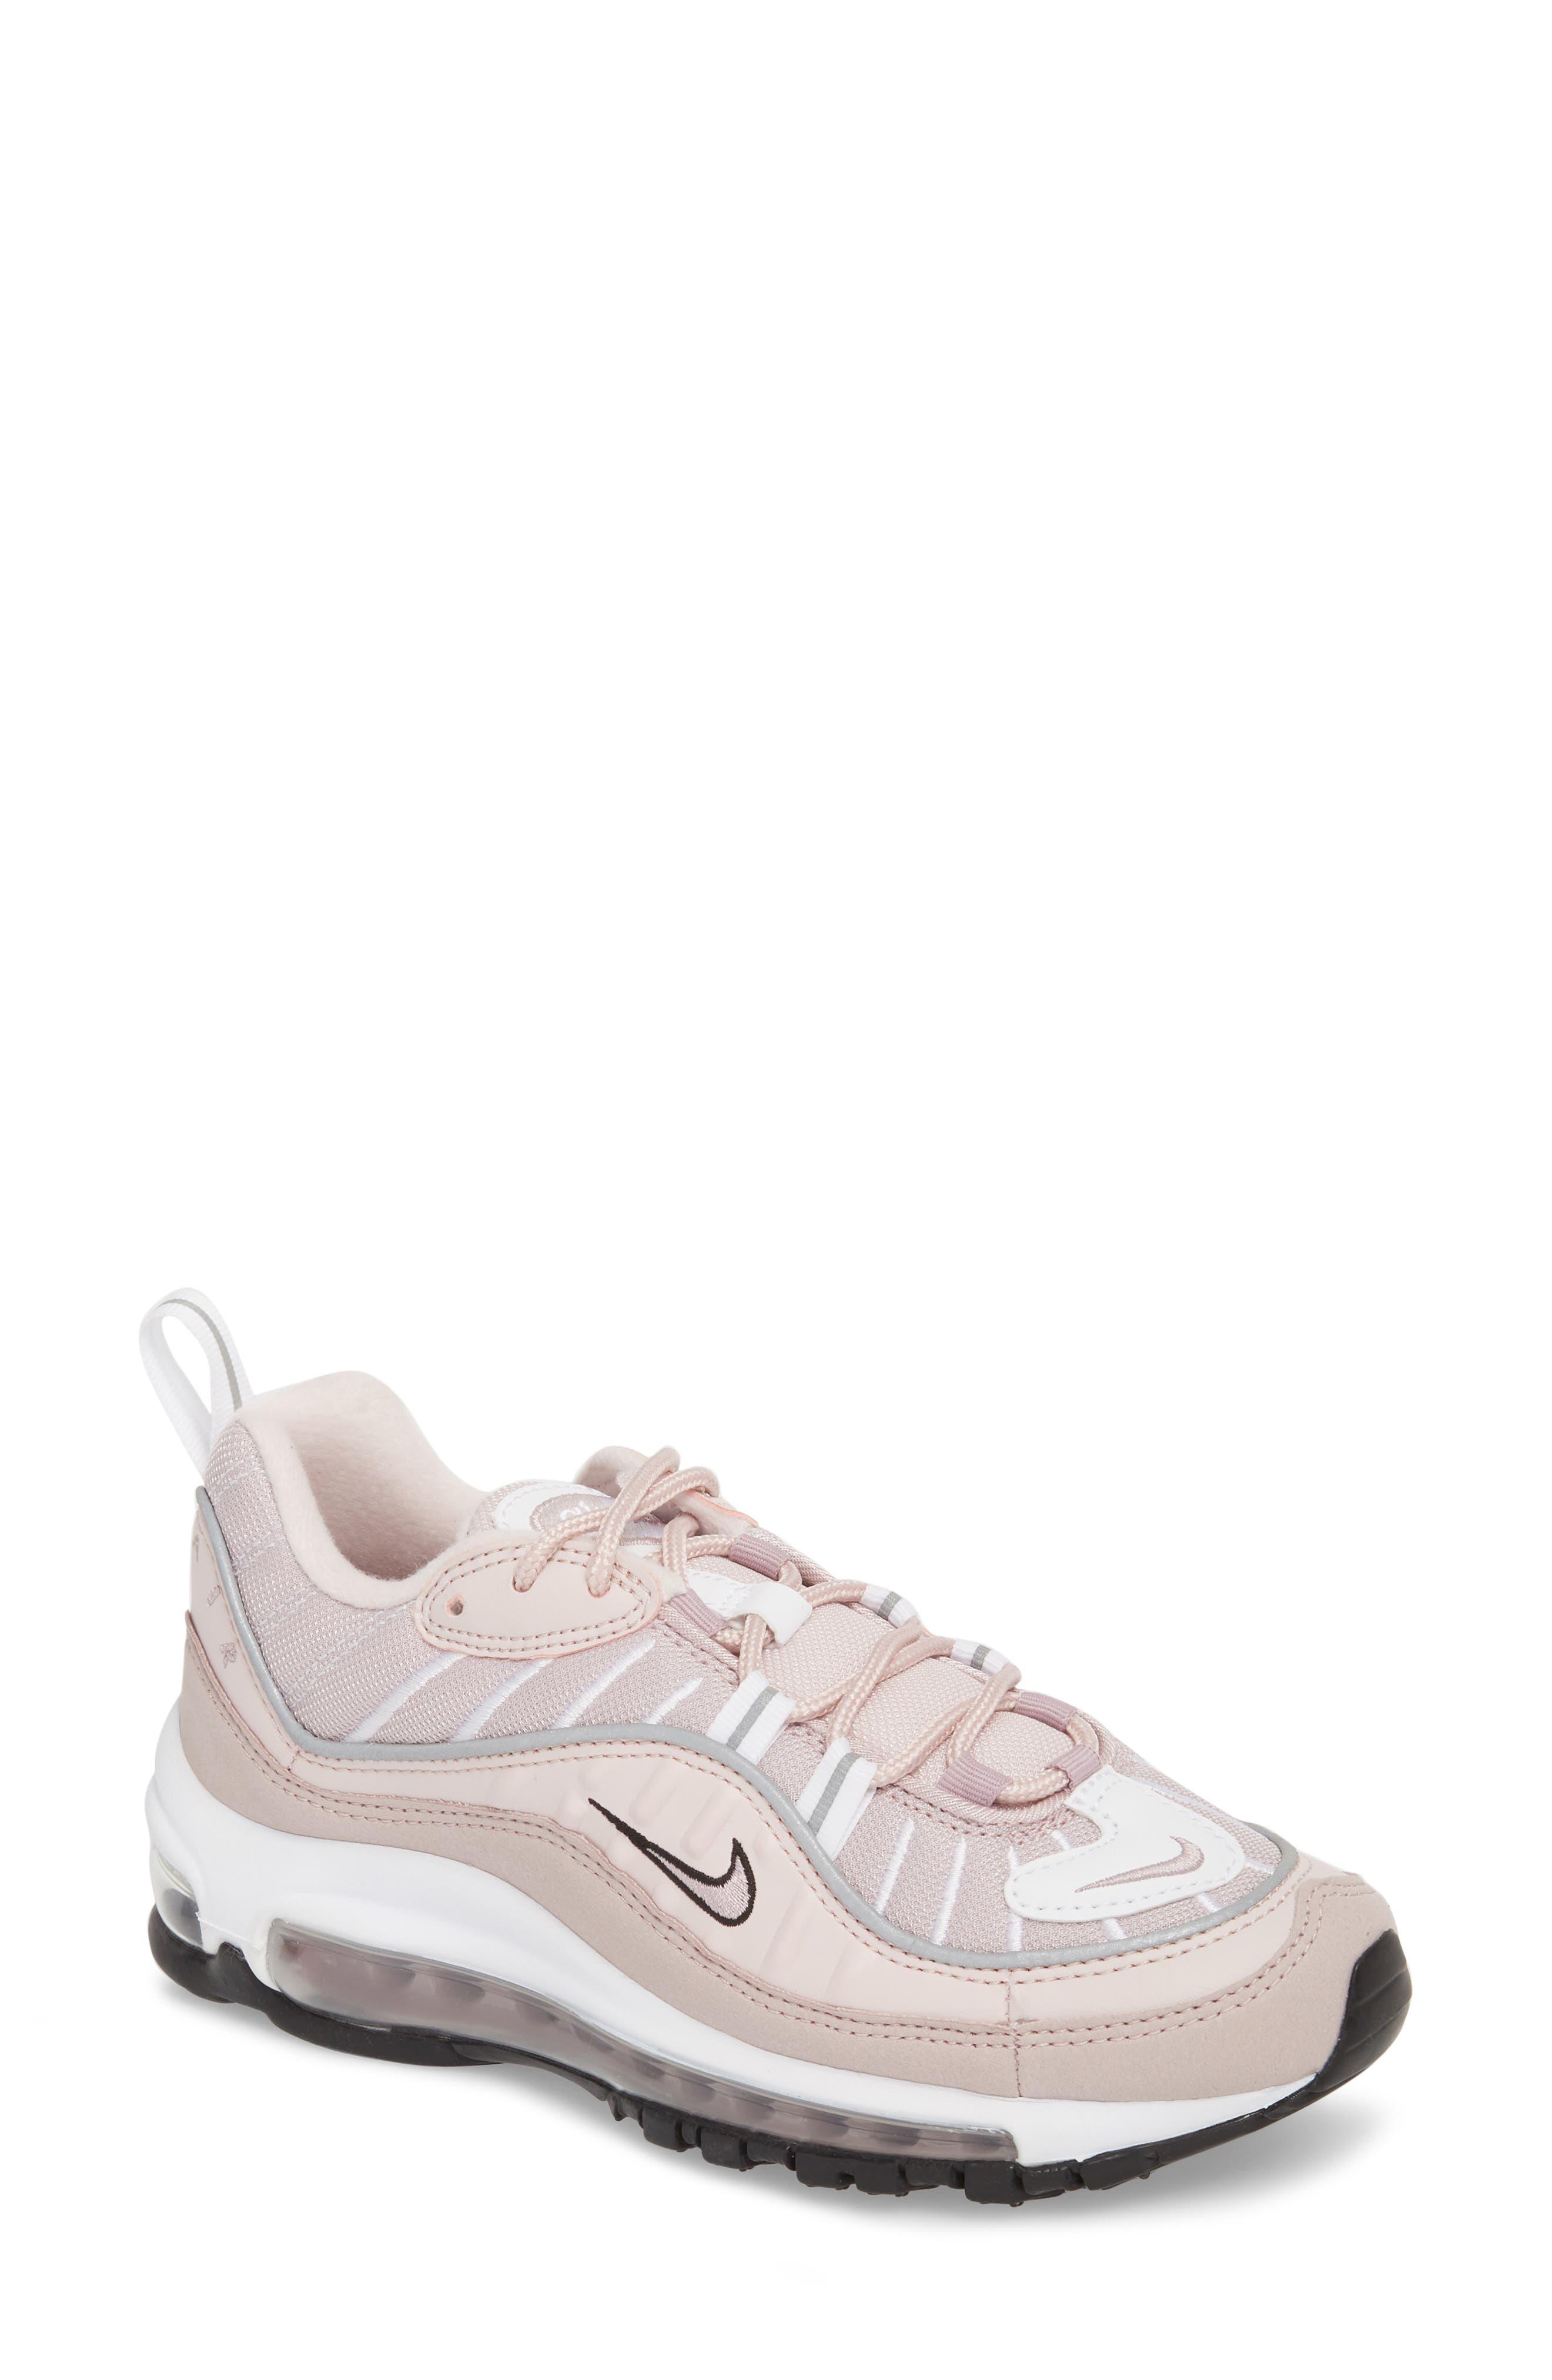 B812a Huarache Nike Cool France Tint Grey B3c47 Internationalist Sunset 4j35LqAR